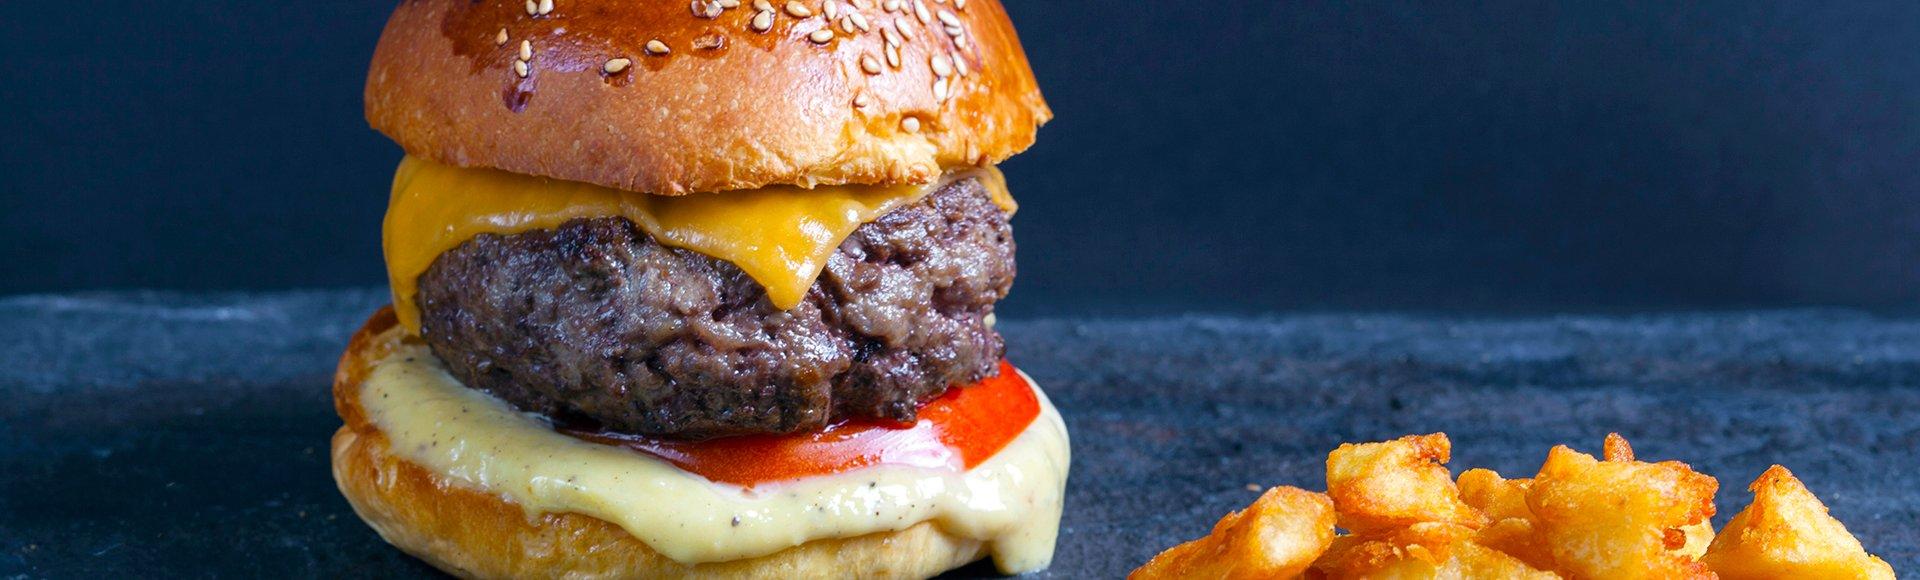 Burger με μοσχαρίσιο μπιφτέκι